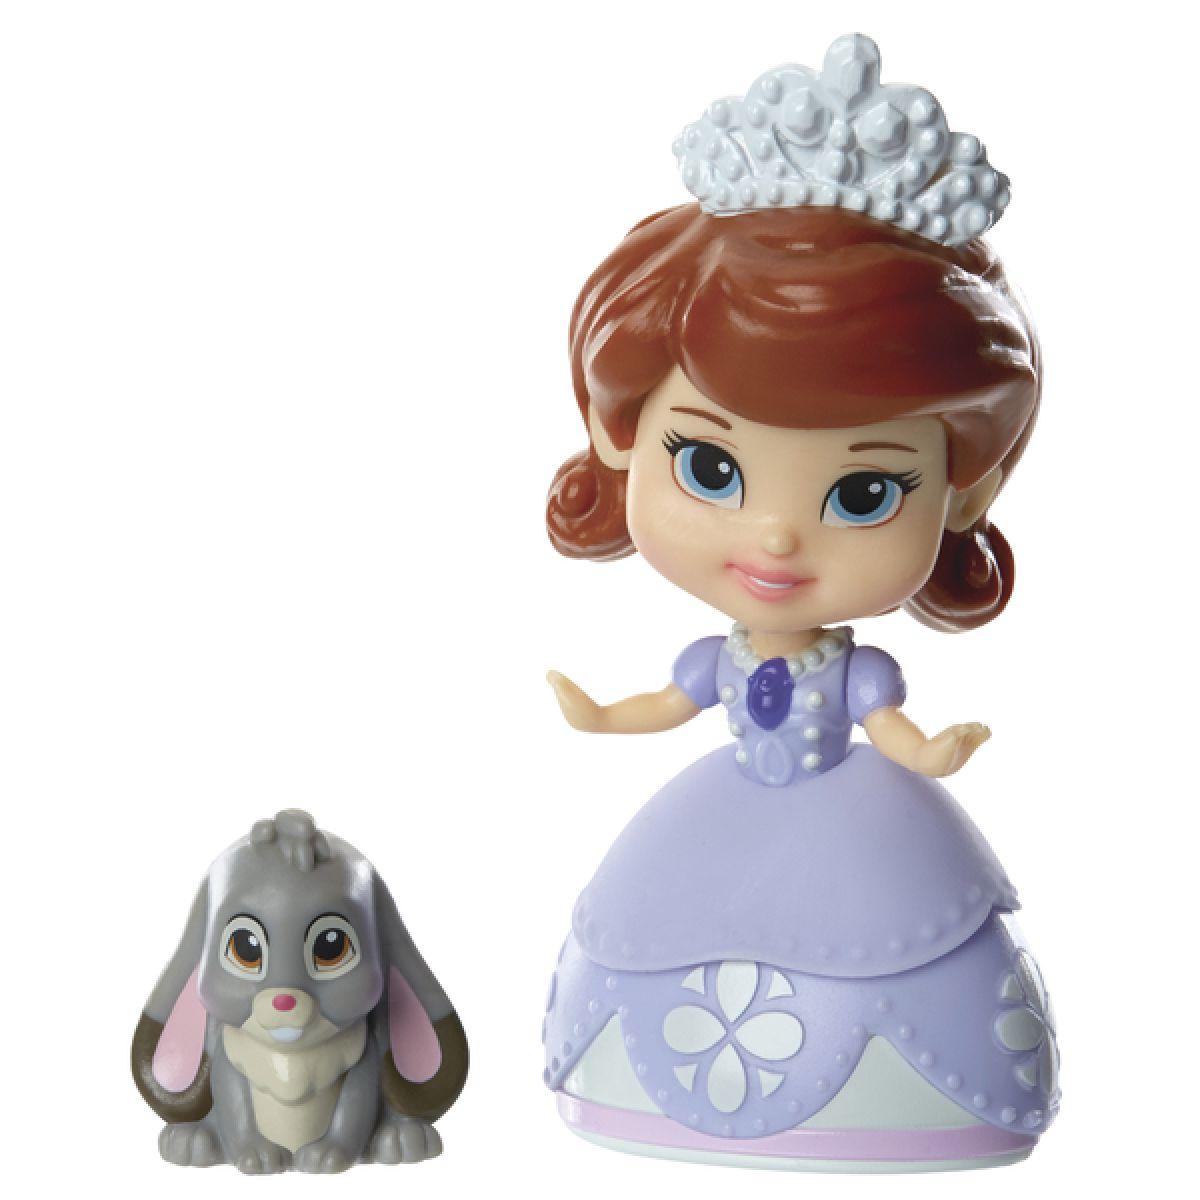 Jakks Pacific Disney Mini princezna a kamarád - Sofia and Clover